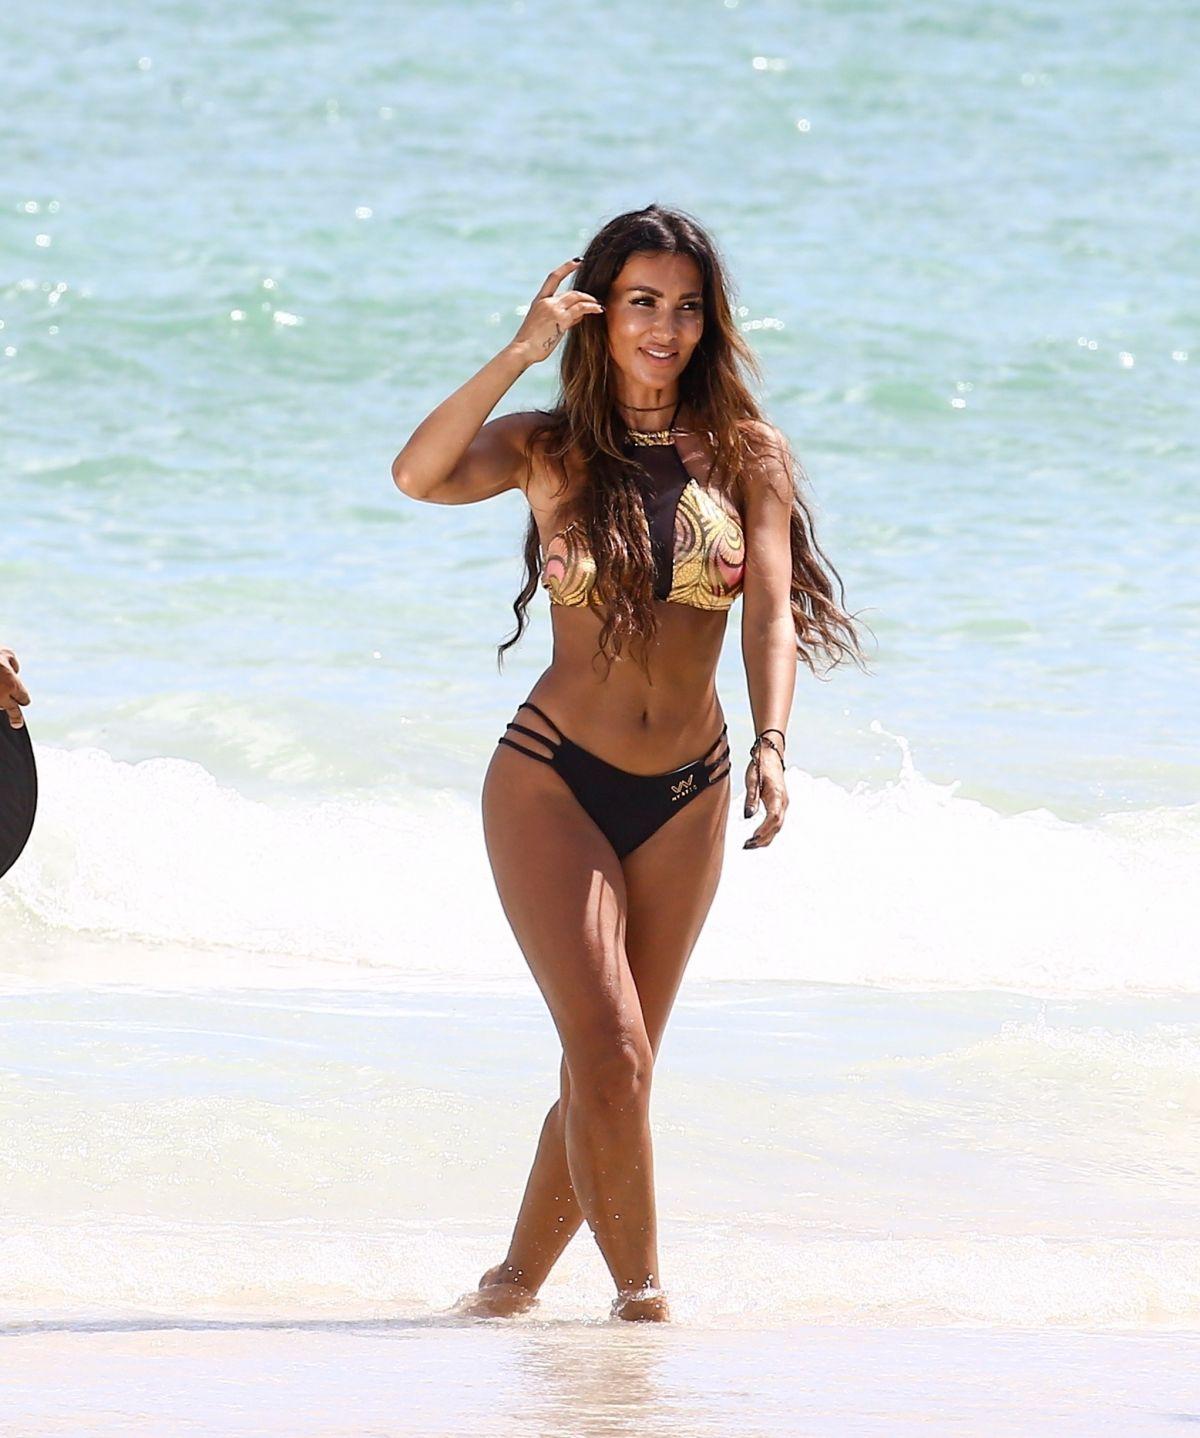 Metisha Schaefer Bikini Photoshoot on Miami Beach Pic 4 of 35